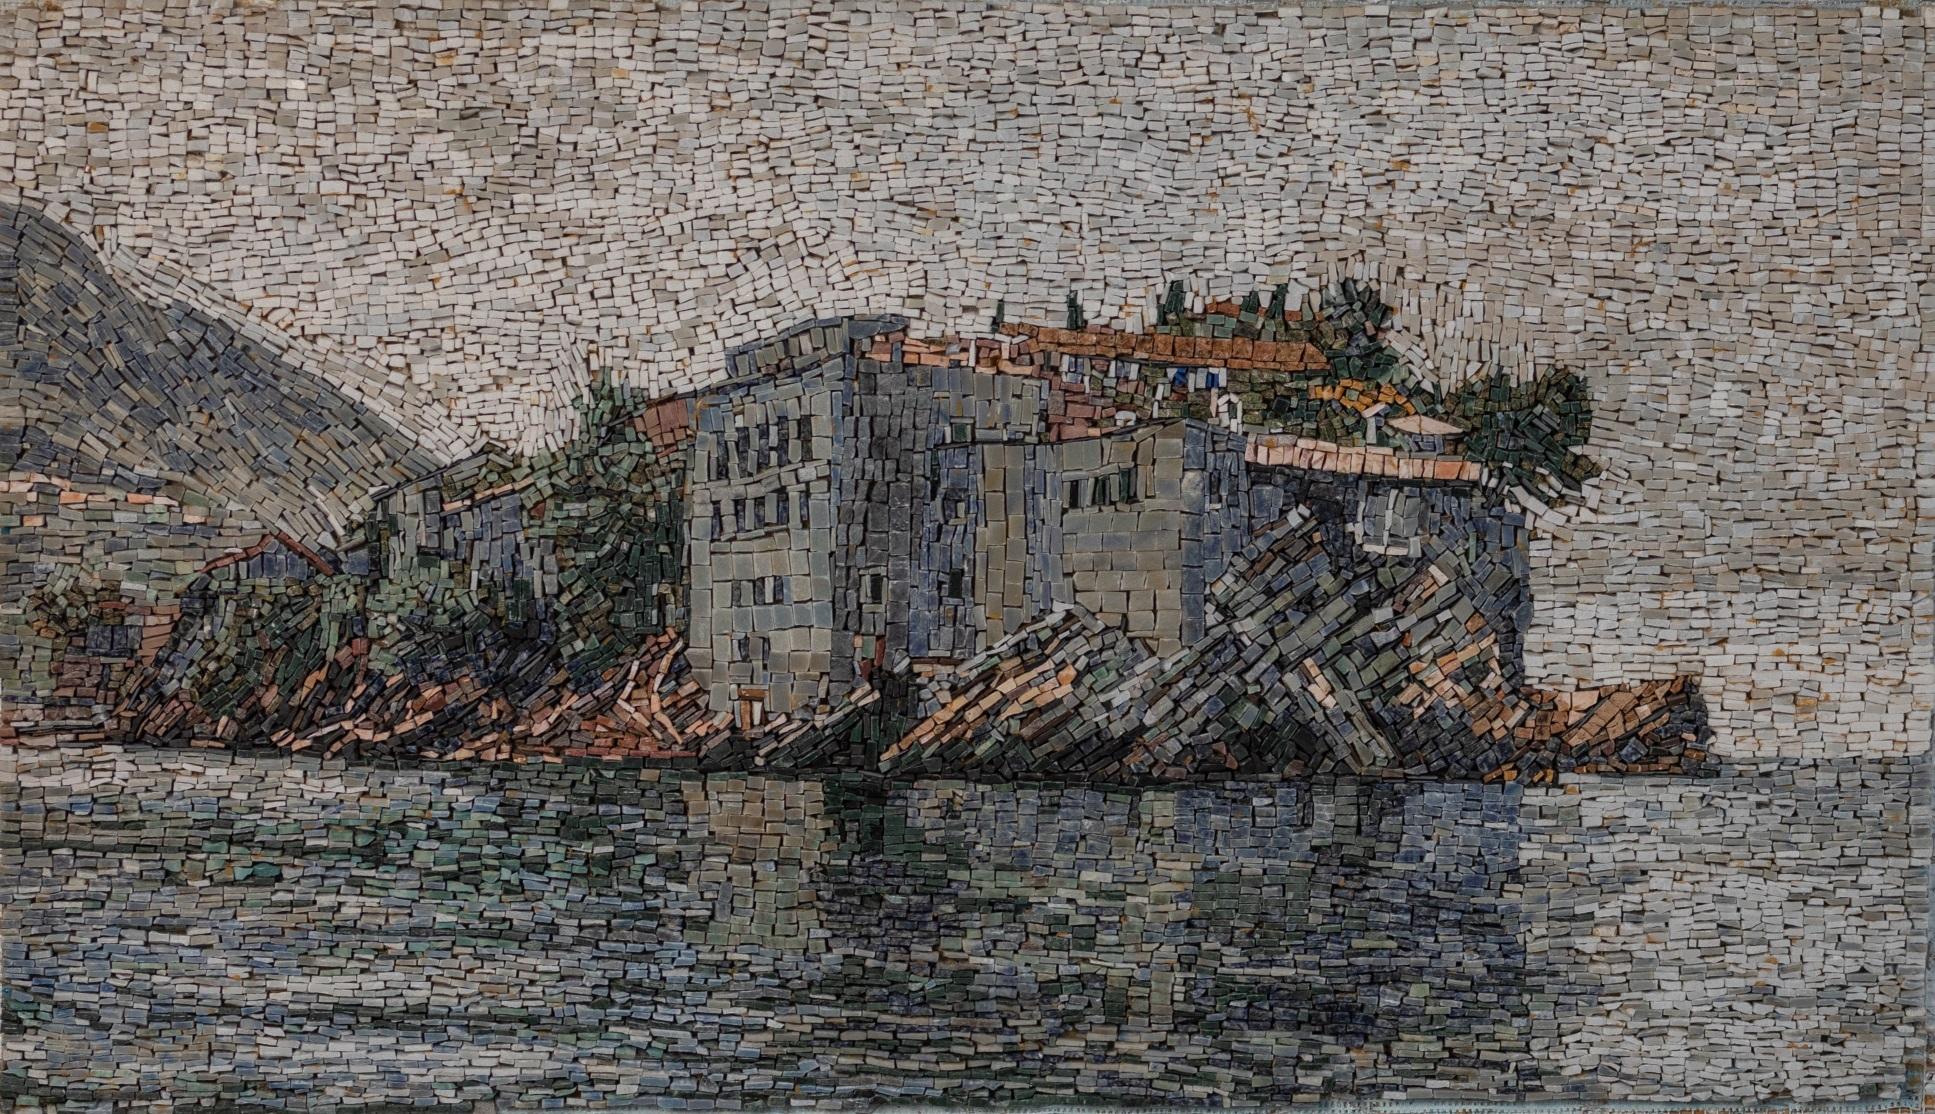 mozaik_sv._stefan_pejzaz_jovan_paka_kentera